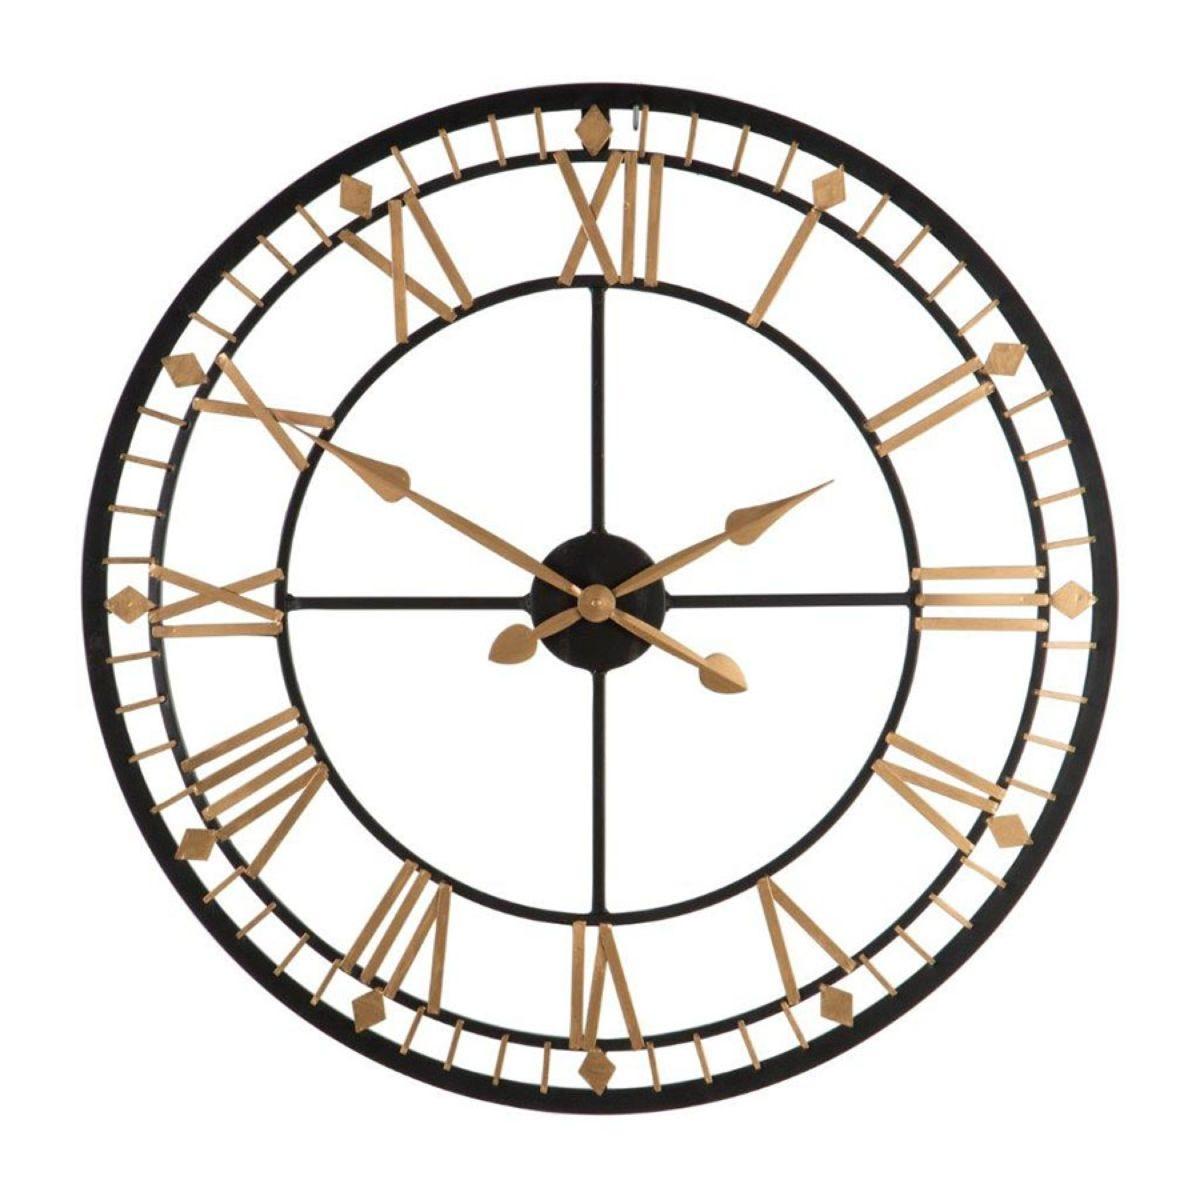 Metal Wall Clock - Black and Gold